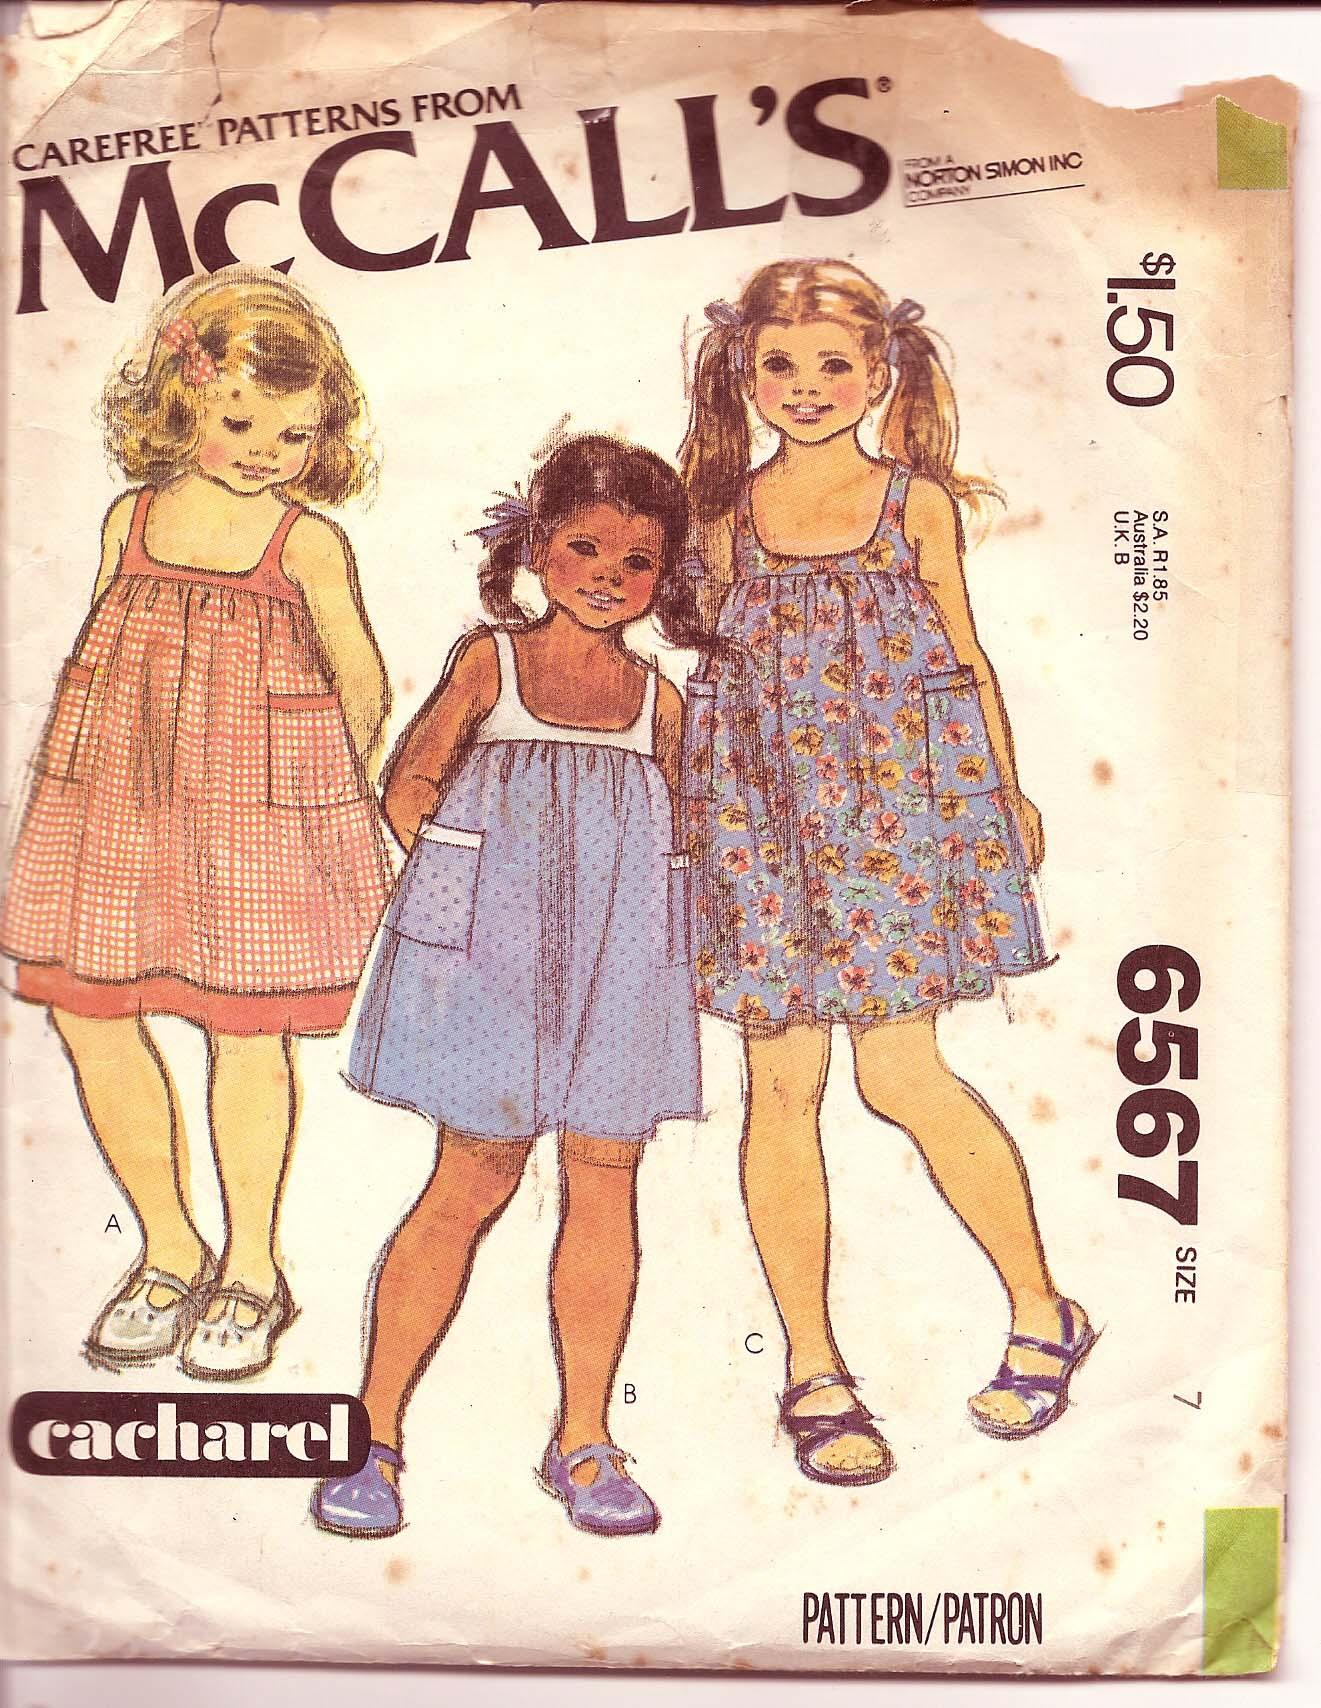 McCall's 6567 A